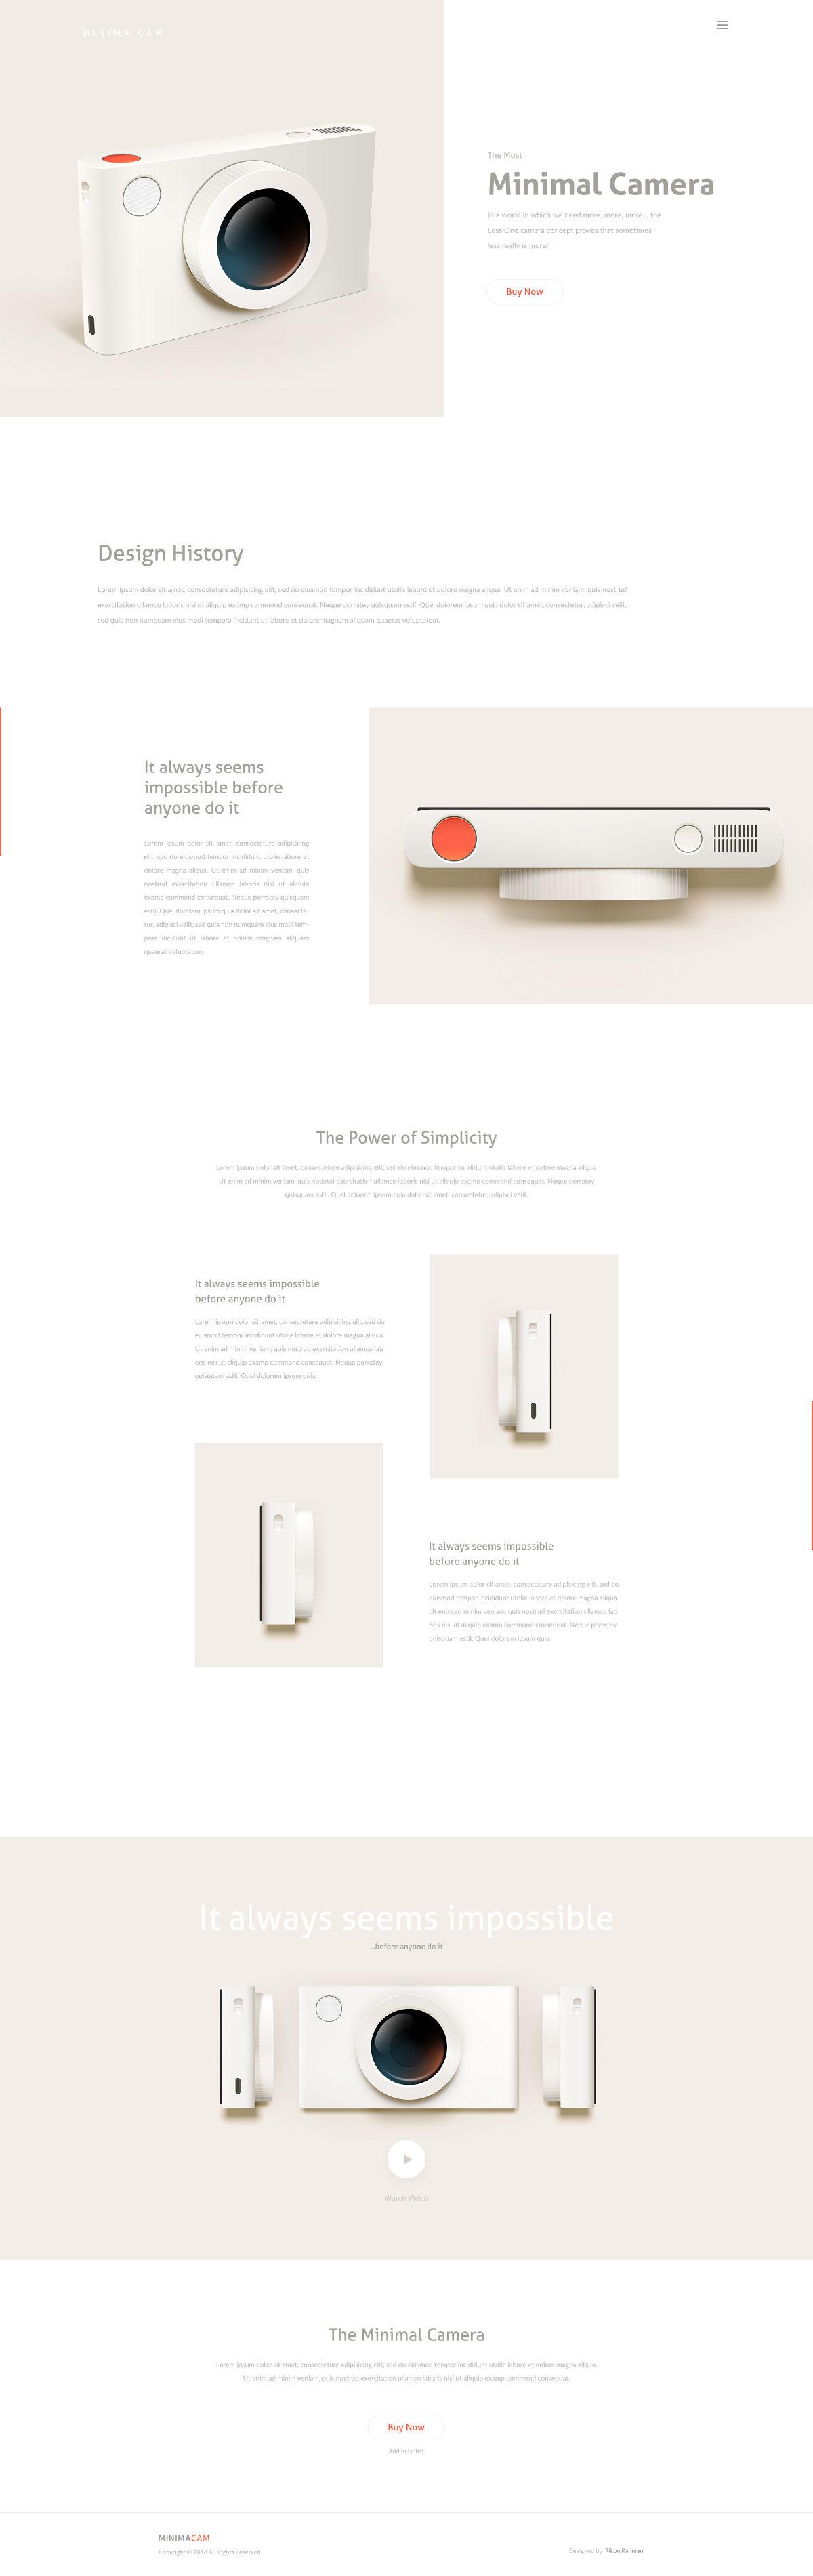 MinimaCam - Free Camera Landing Page